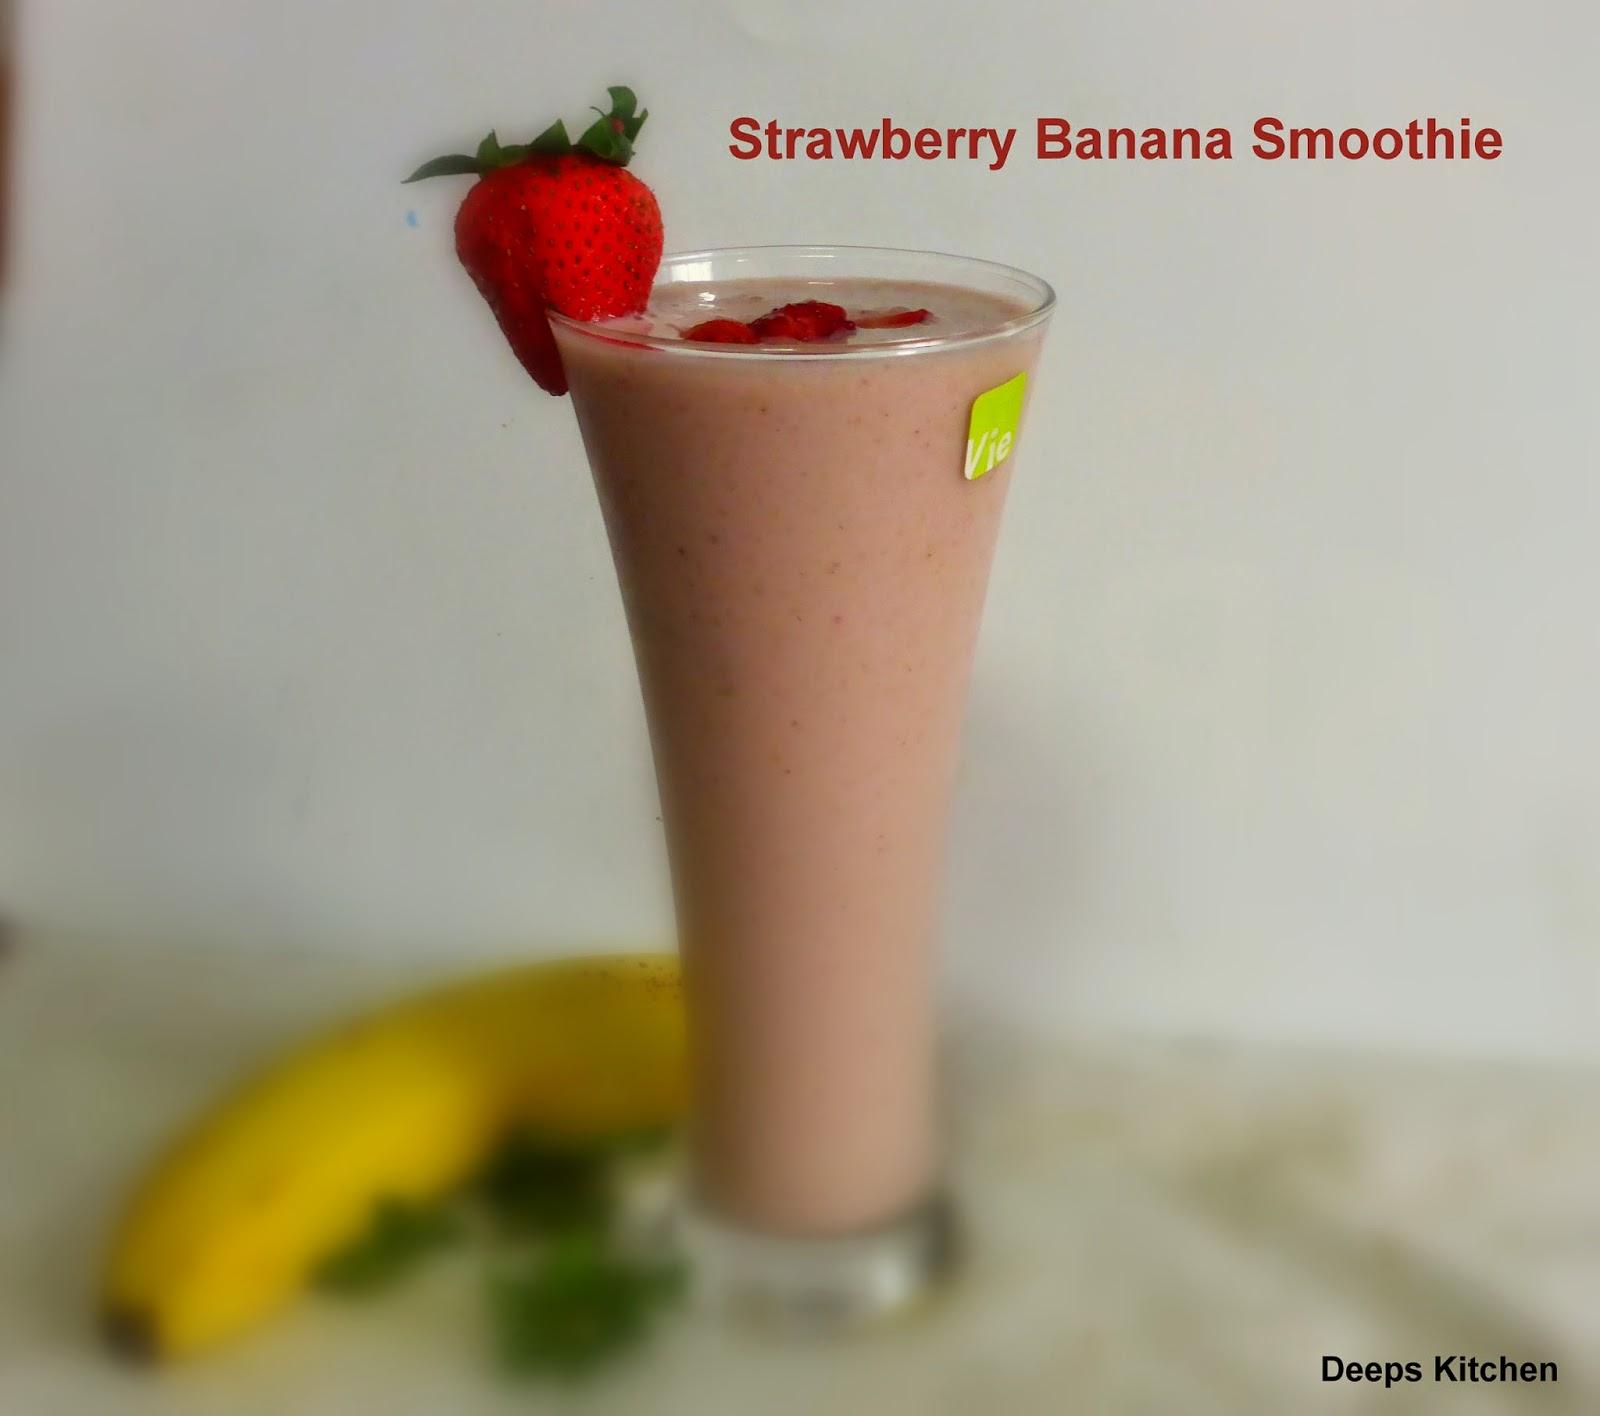 Strawberry Banana Milkshake or smoothie